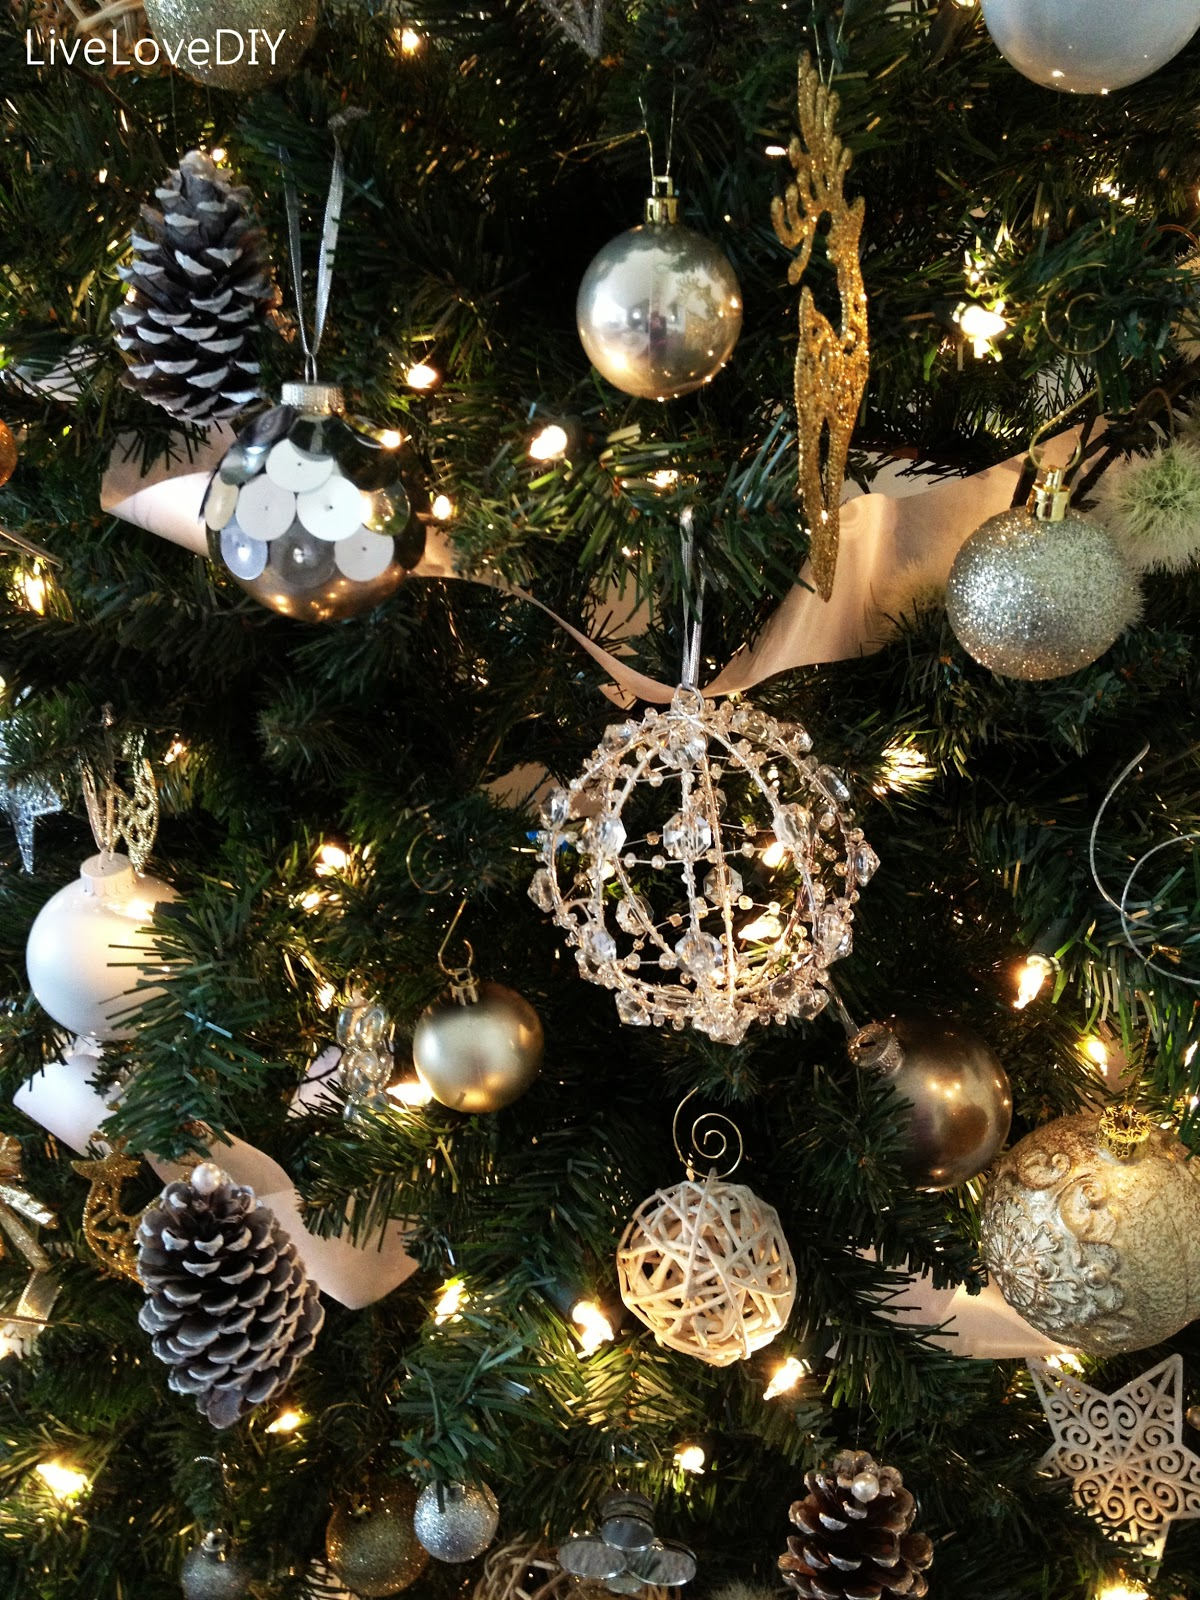 LiveLoveDIY DIY Christmas Tree Decor